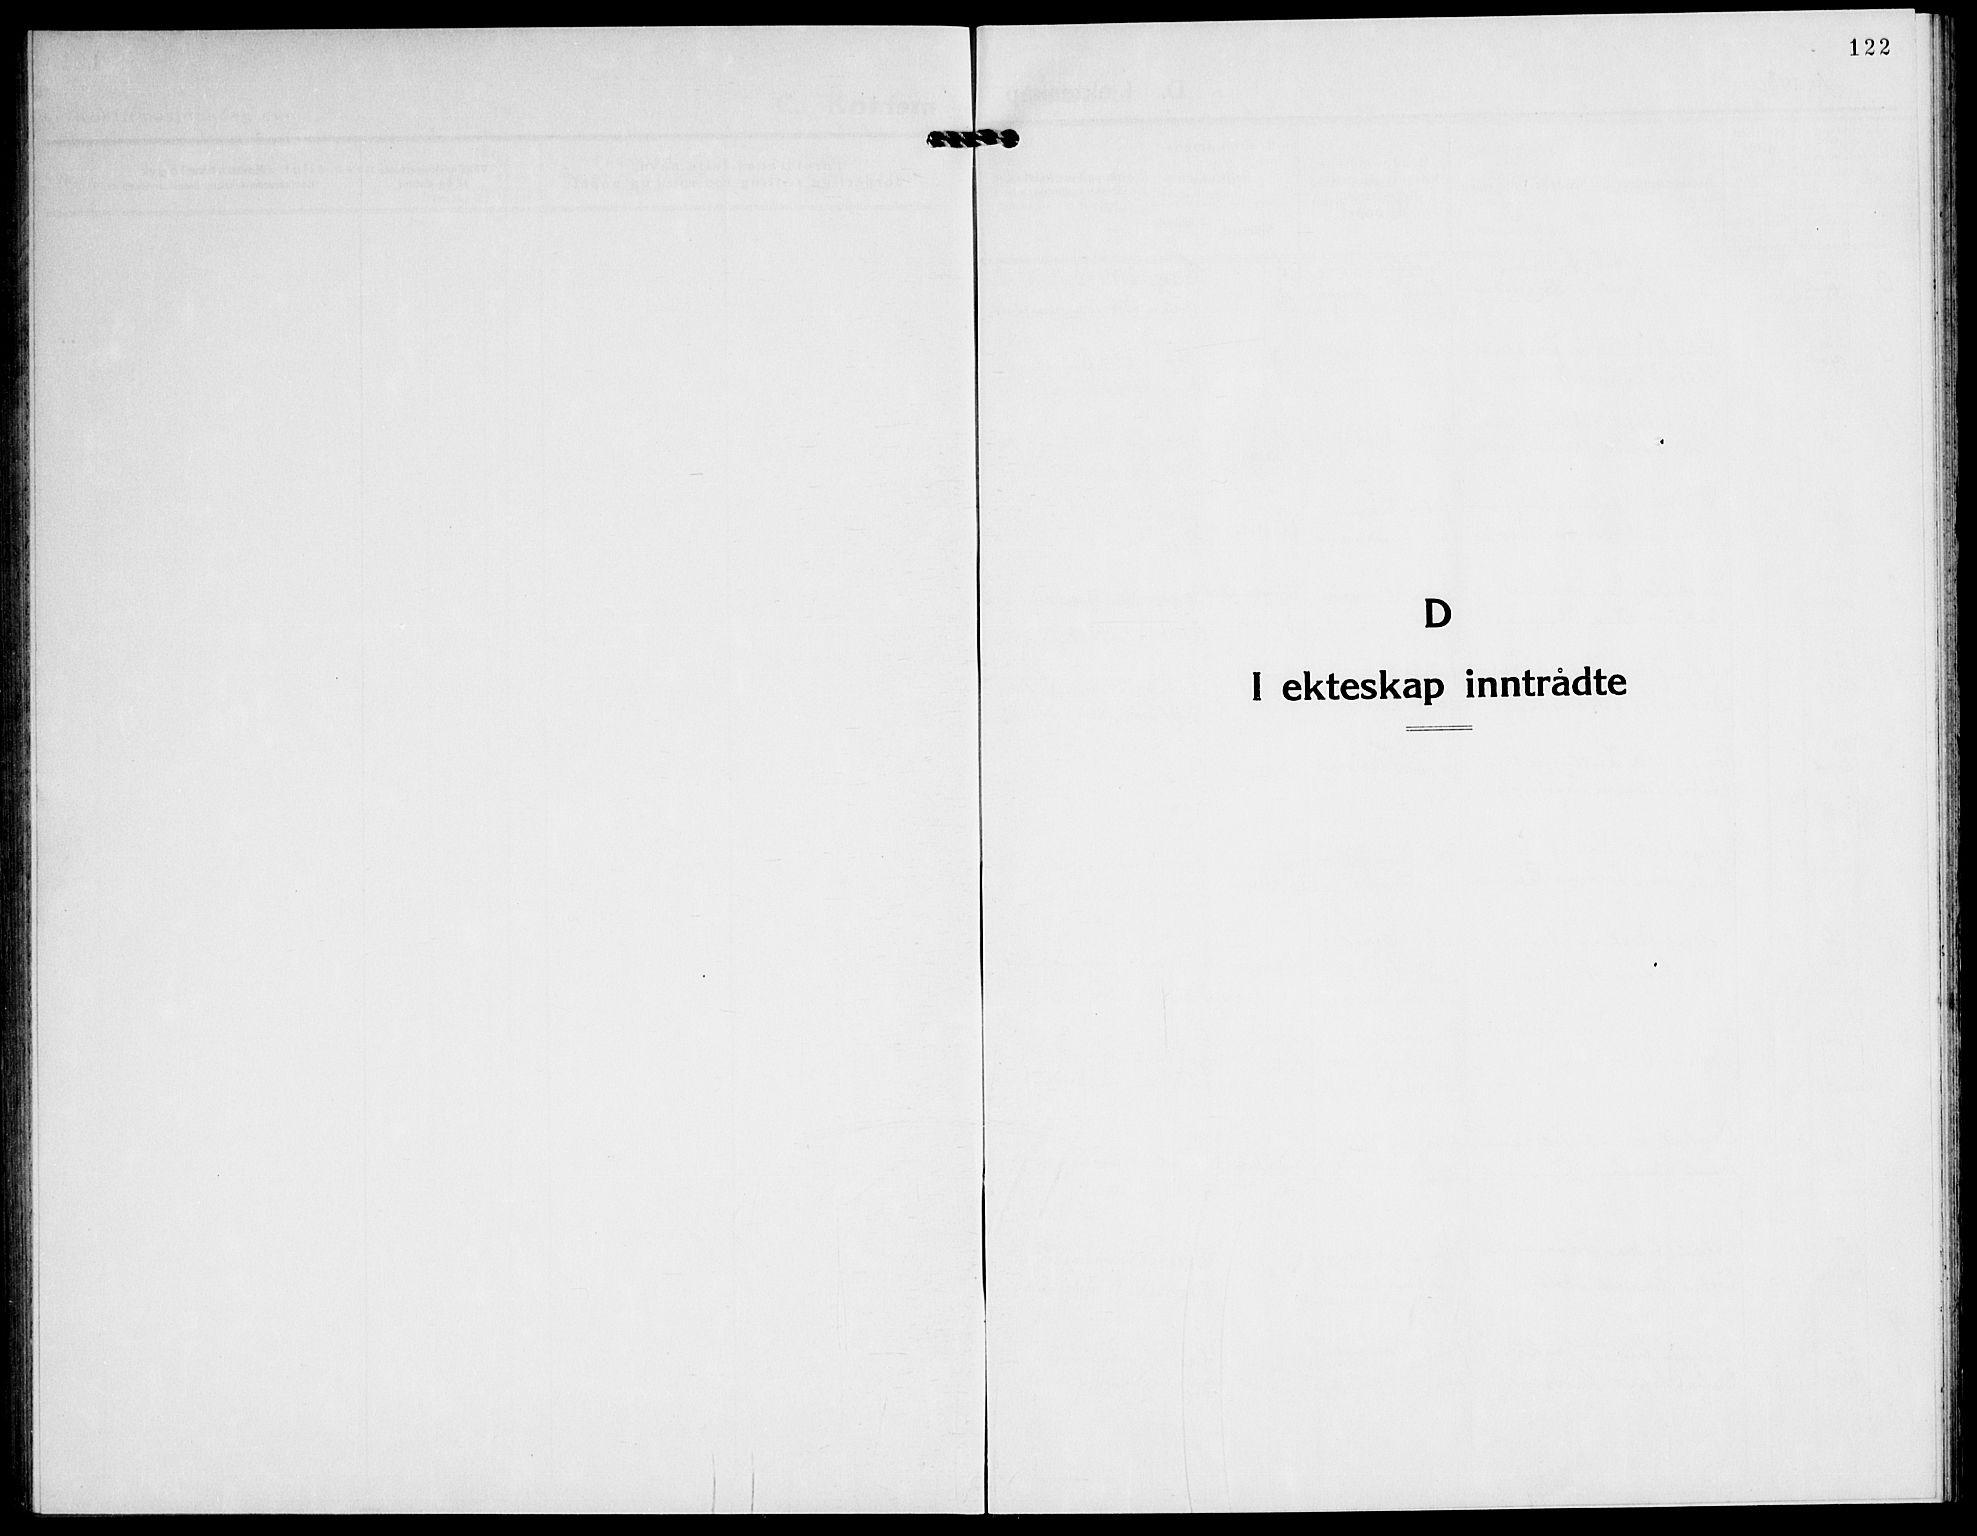 SATØ, Tranøy sokneprestkontor, I/Ia/Iab/L0016klokker: Klokkerbok nr. 16, 1930-1945, s. 122